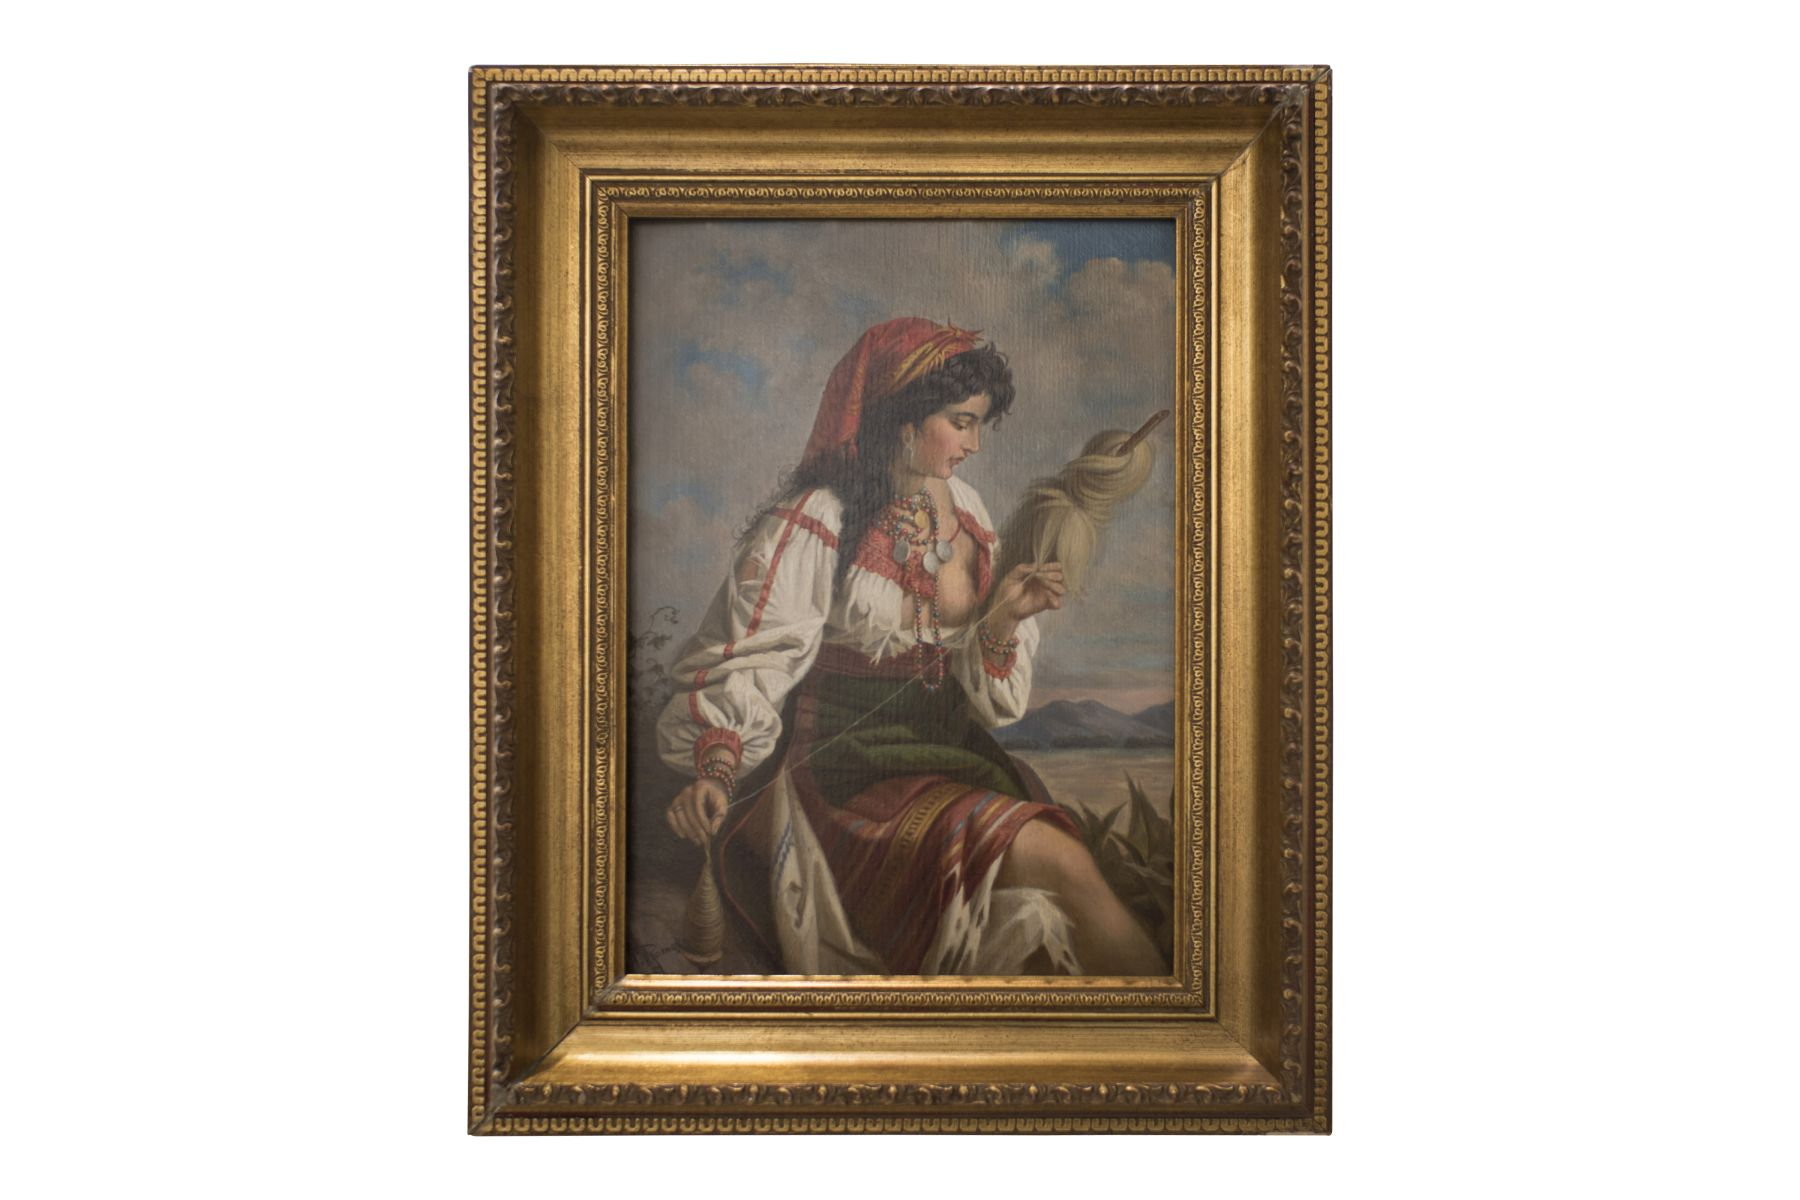 "#145 Anton Romako (1832-1889) ""The Spinner"" | Anton Romako (1832-1889) ""Die Spinnerin"" Image"